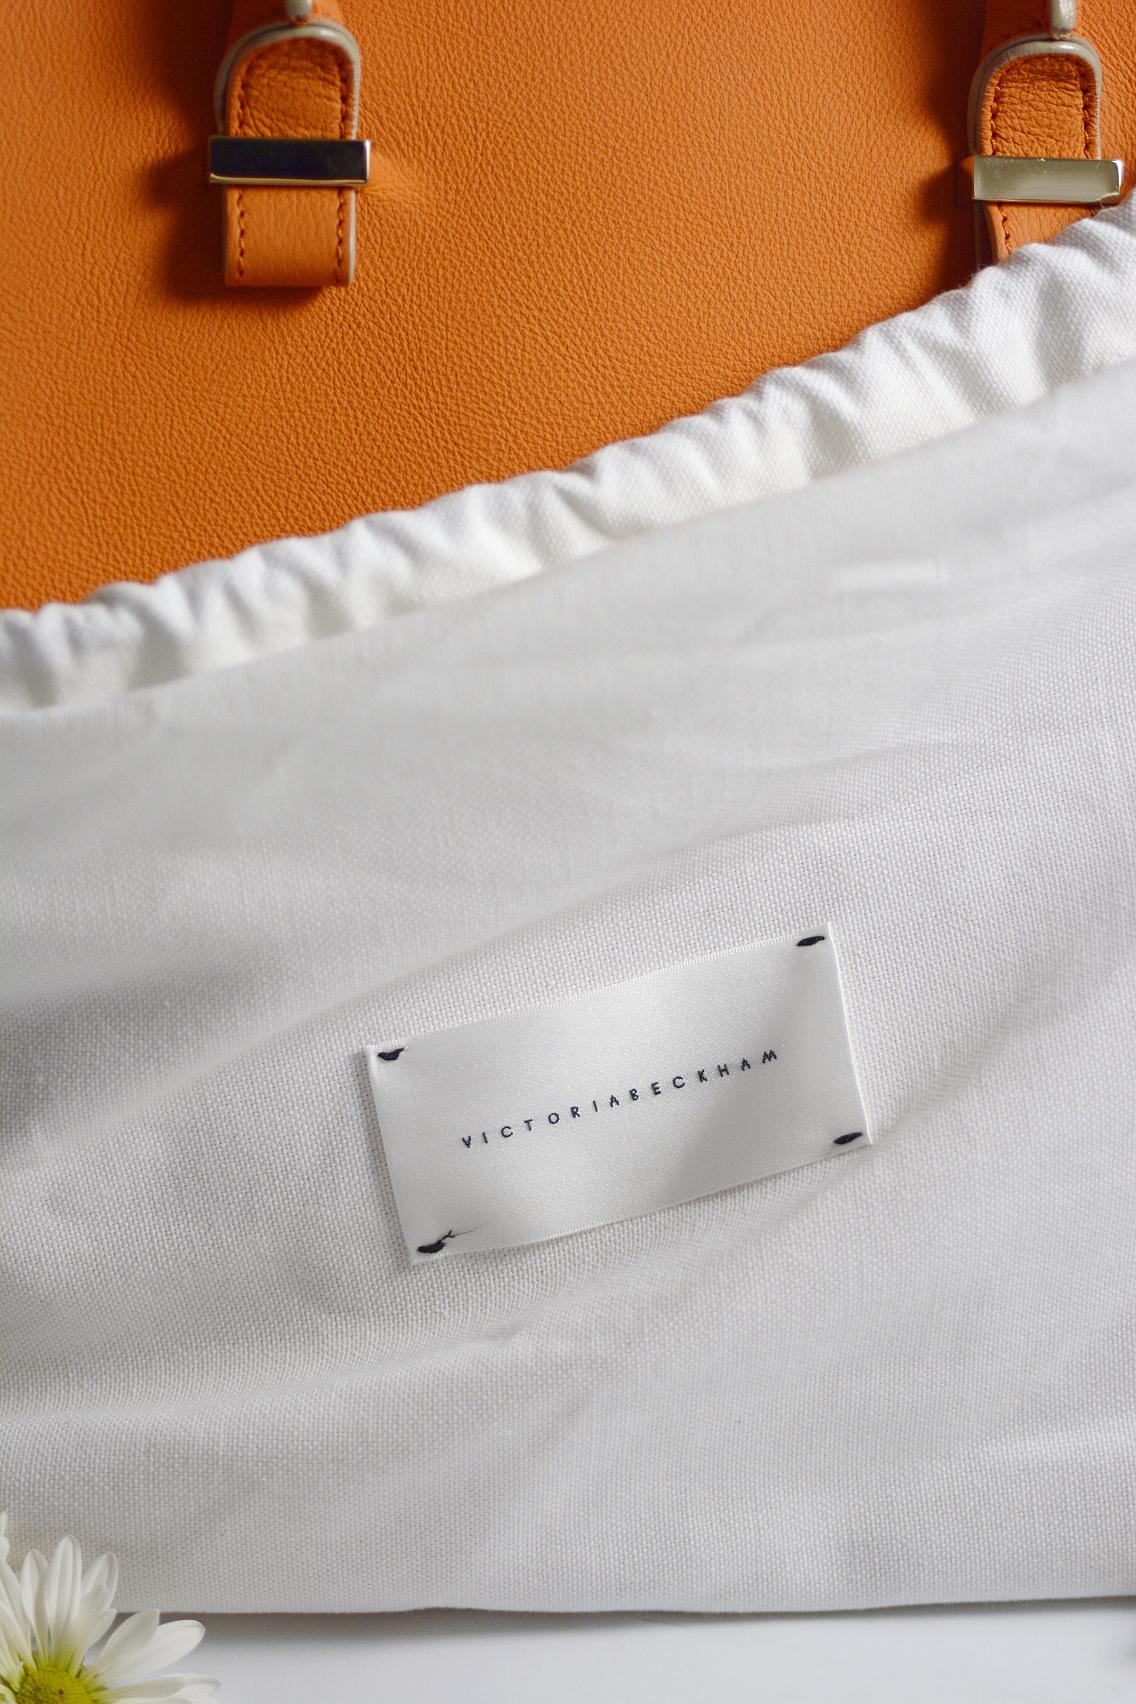 Victoria Beckham Liberty Tote Persimmon Orange 3